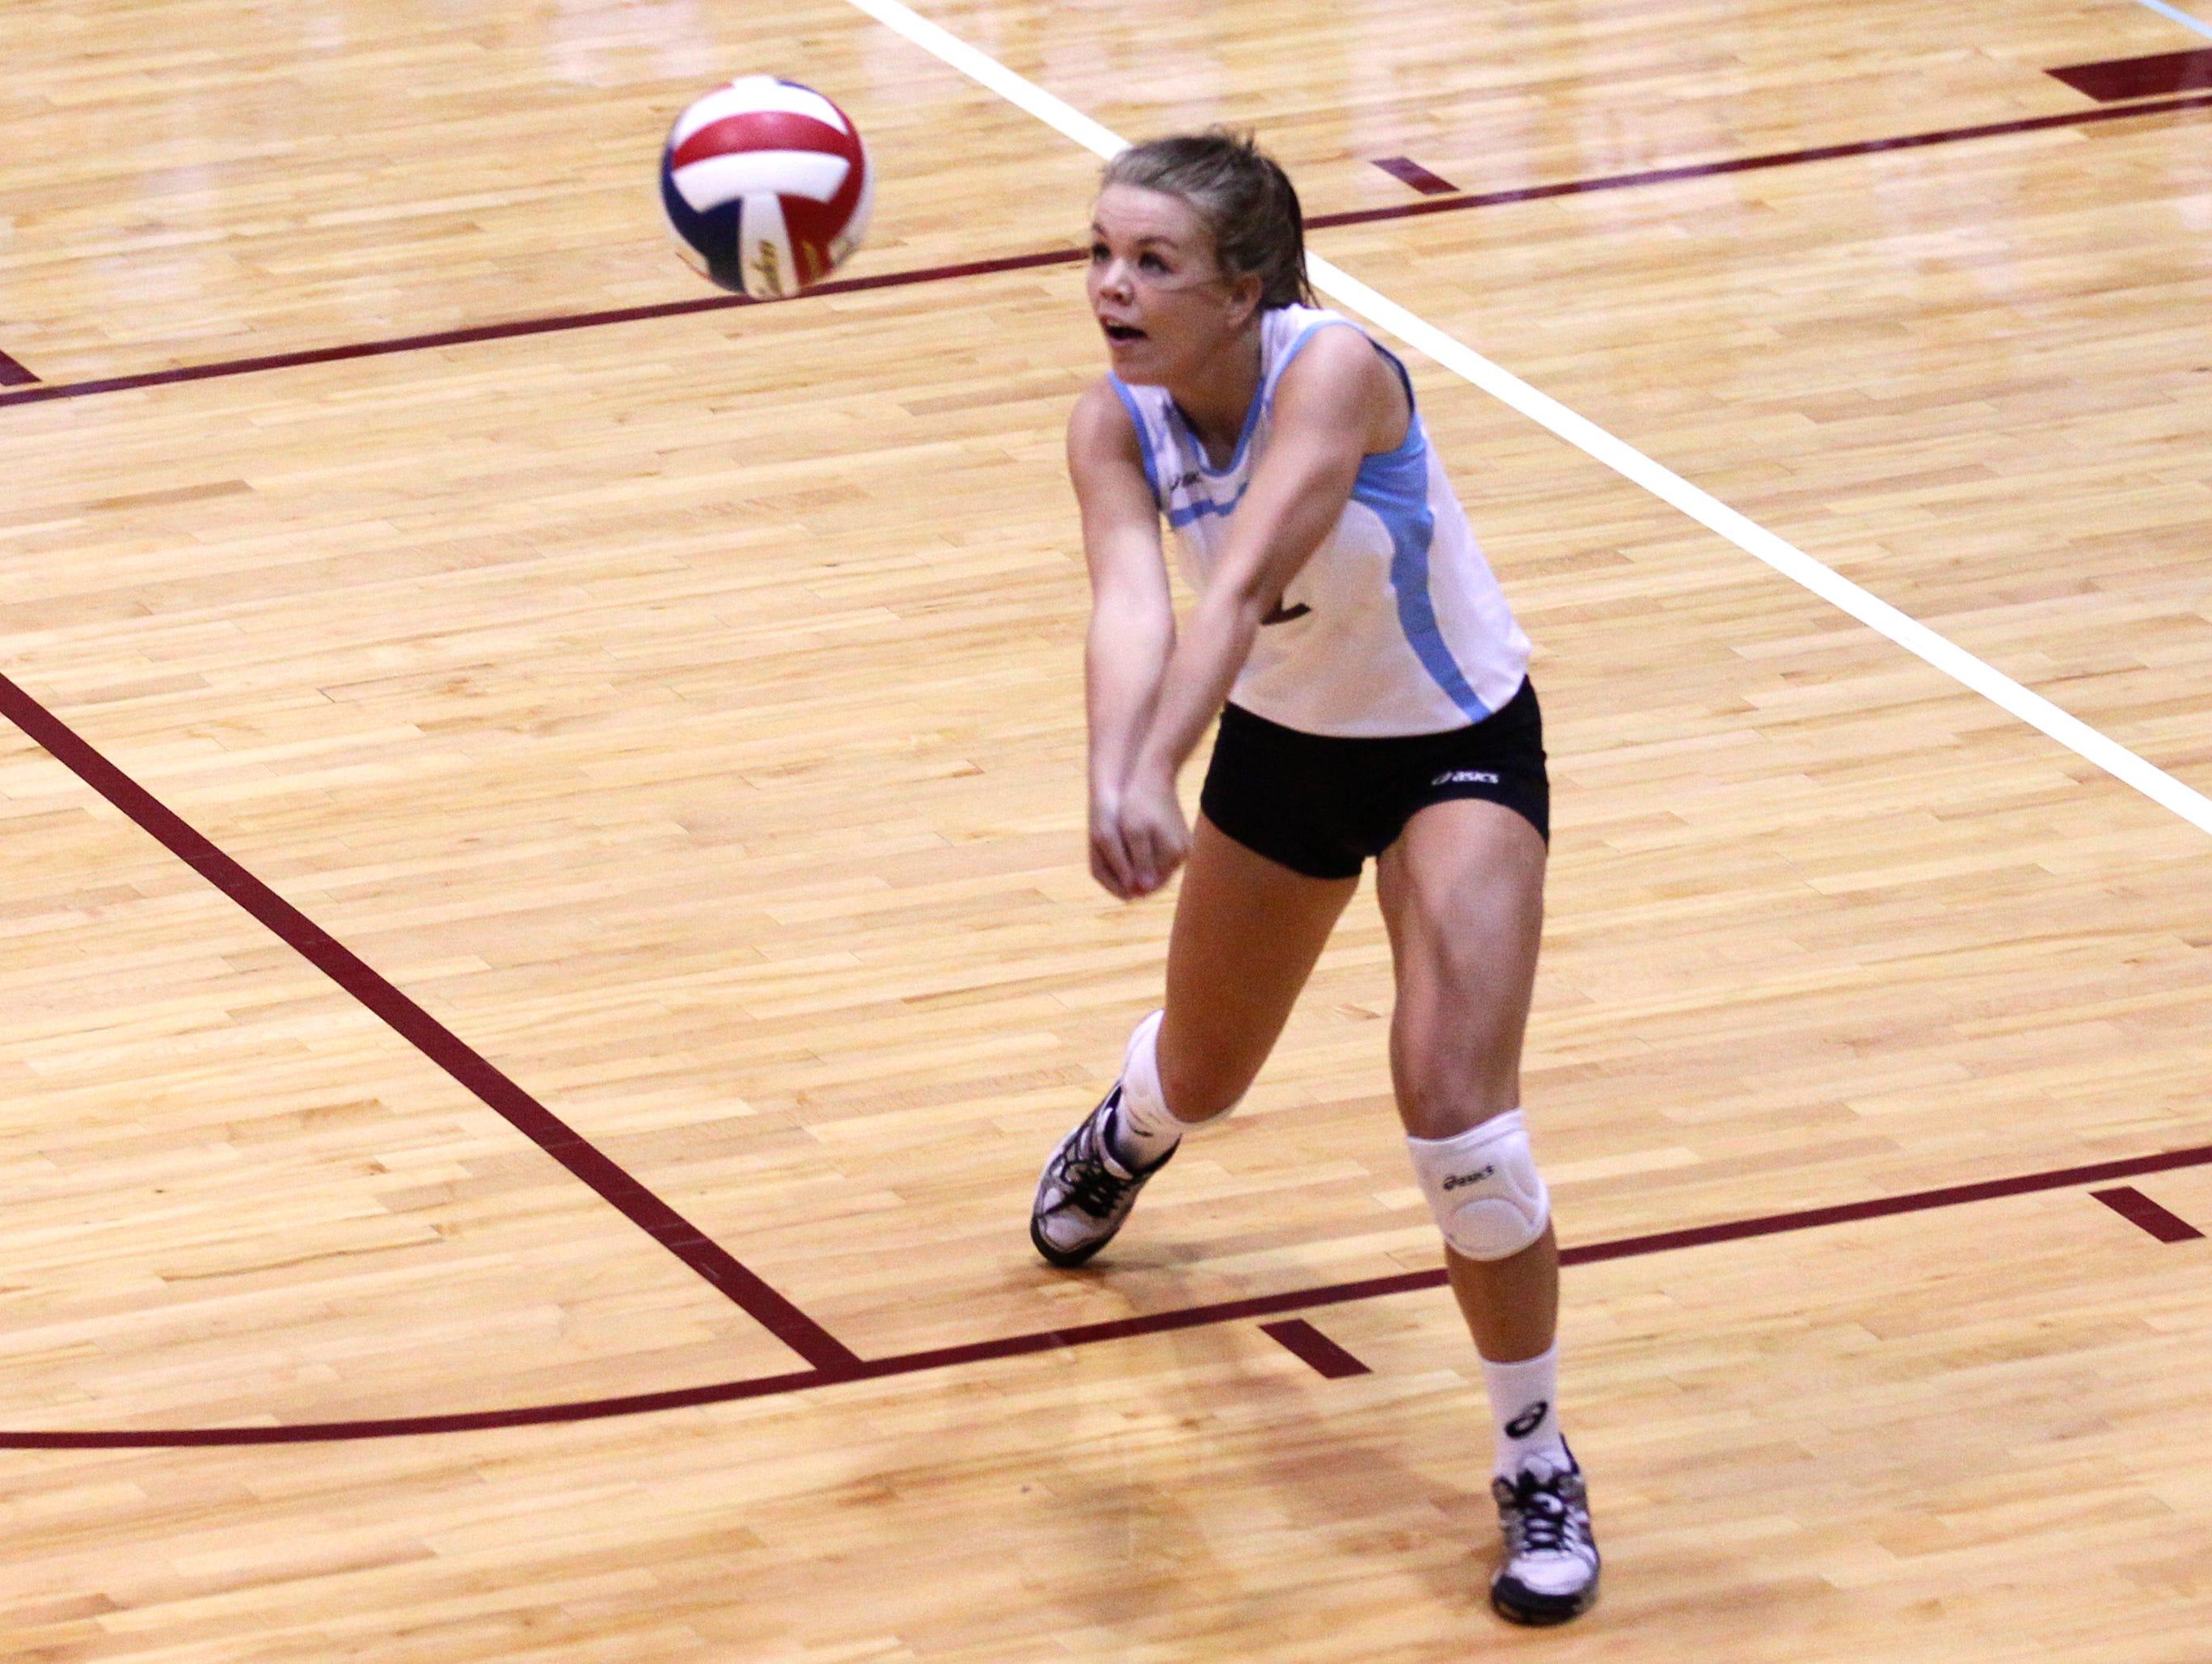 Assumption High School's McKenzie Watson (2) makes the play against Mercy Academy during their volleyball matches at Assumption High School in Louisville, Kentucky. September 8, 2014